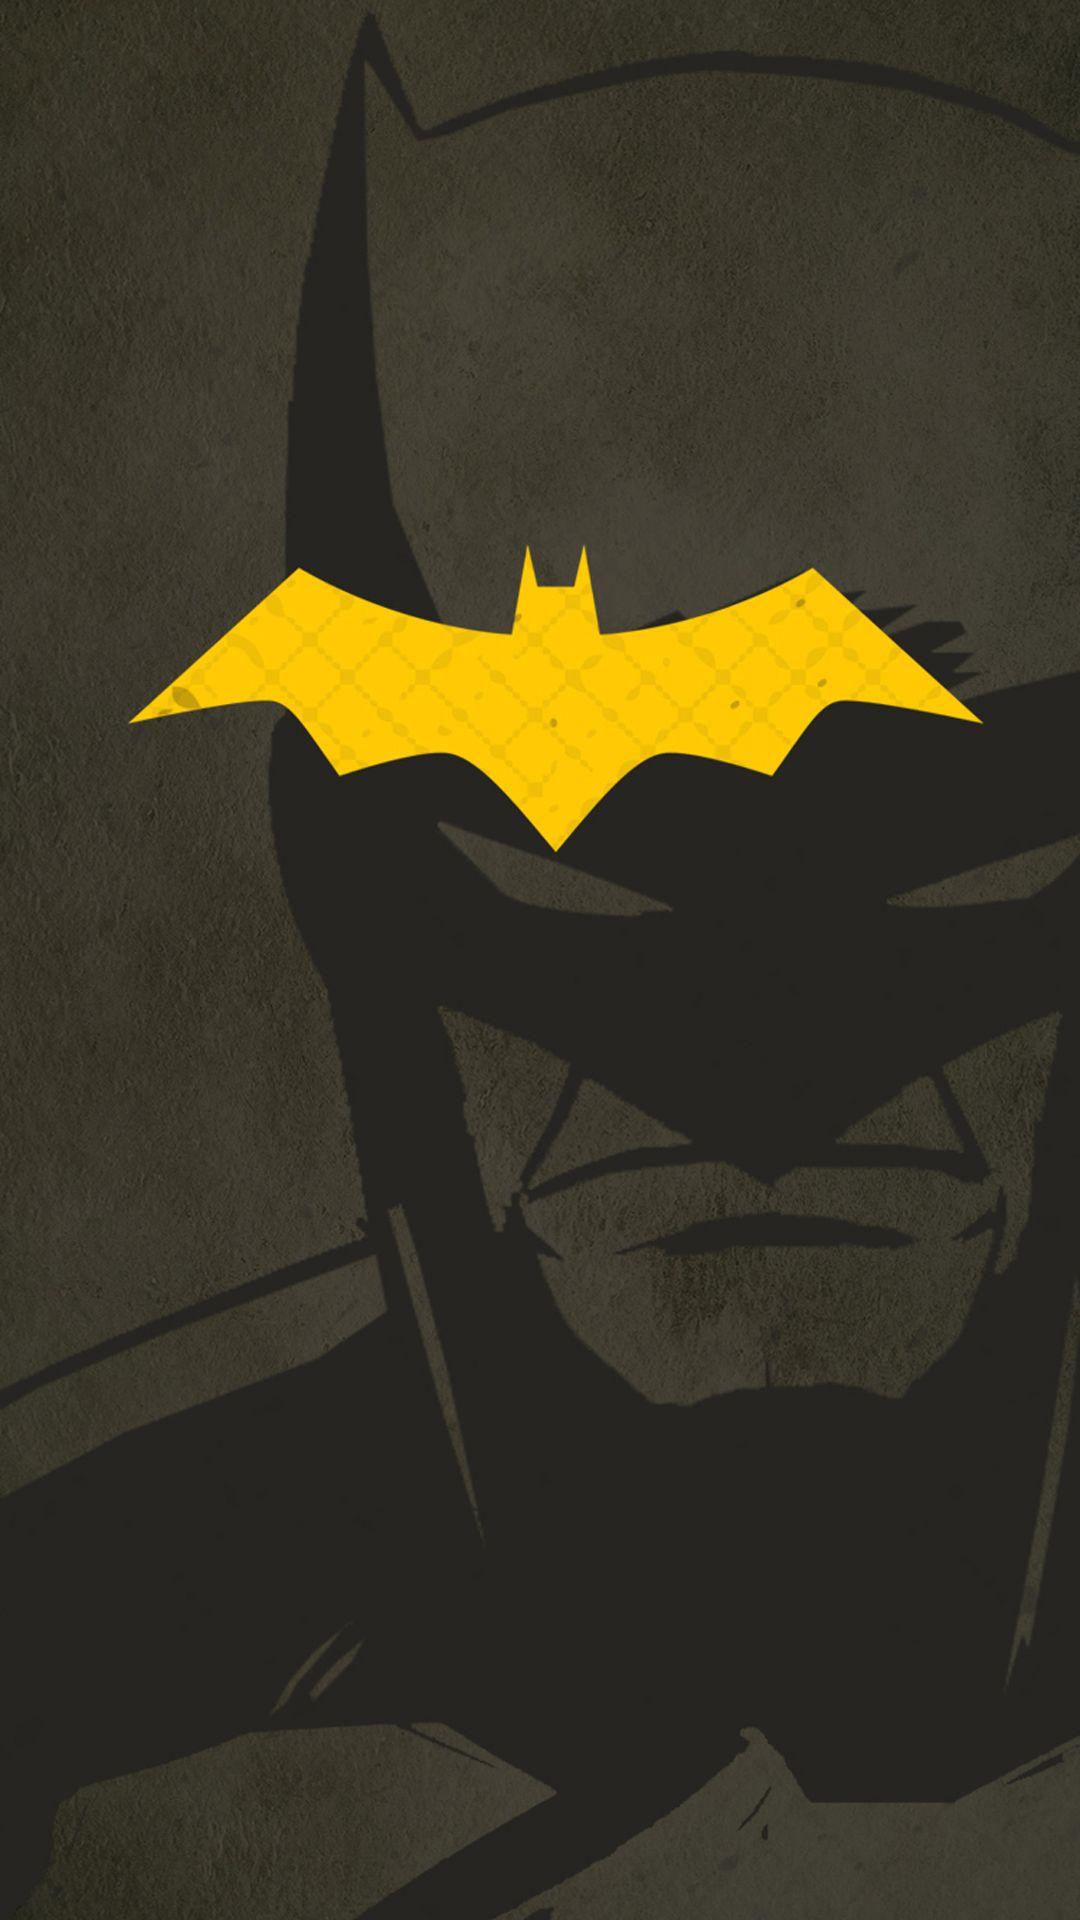 Batman 02 Iphone 6 Plus Batman Wallpaper Superhero Wallpaper Batman Poster